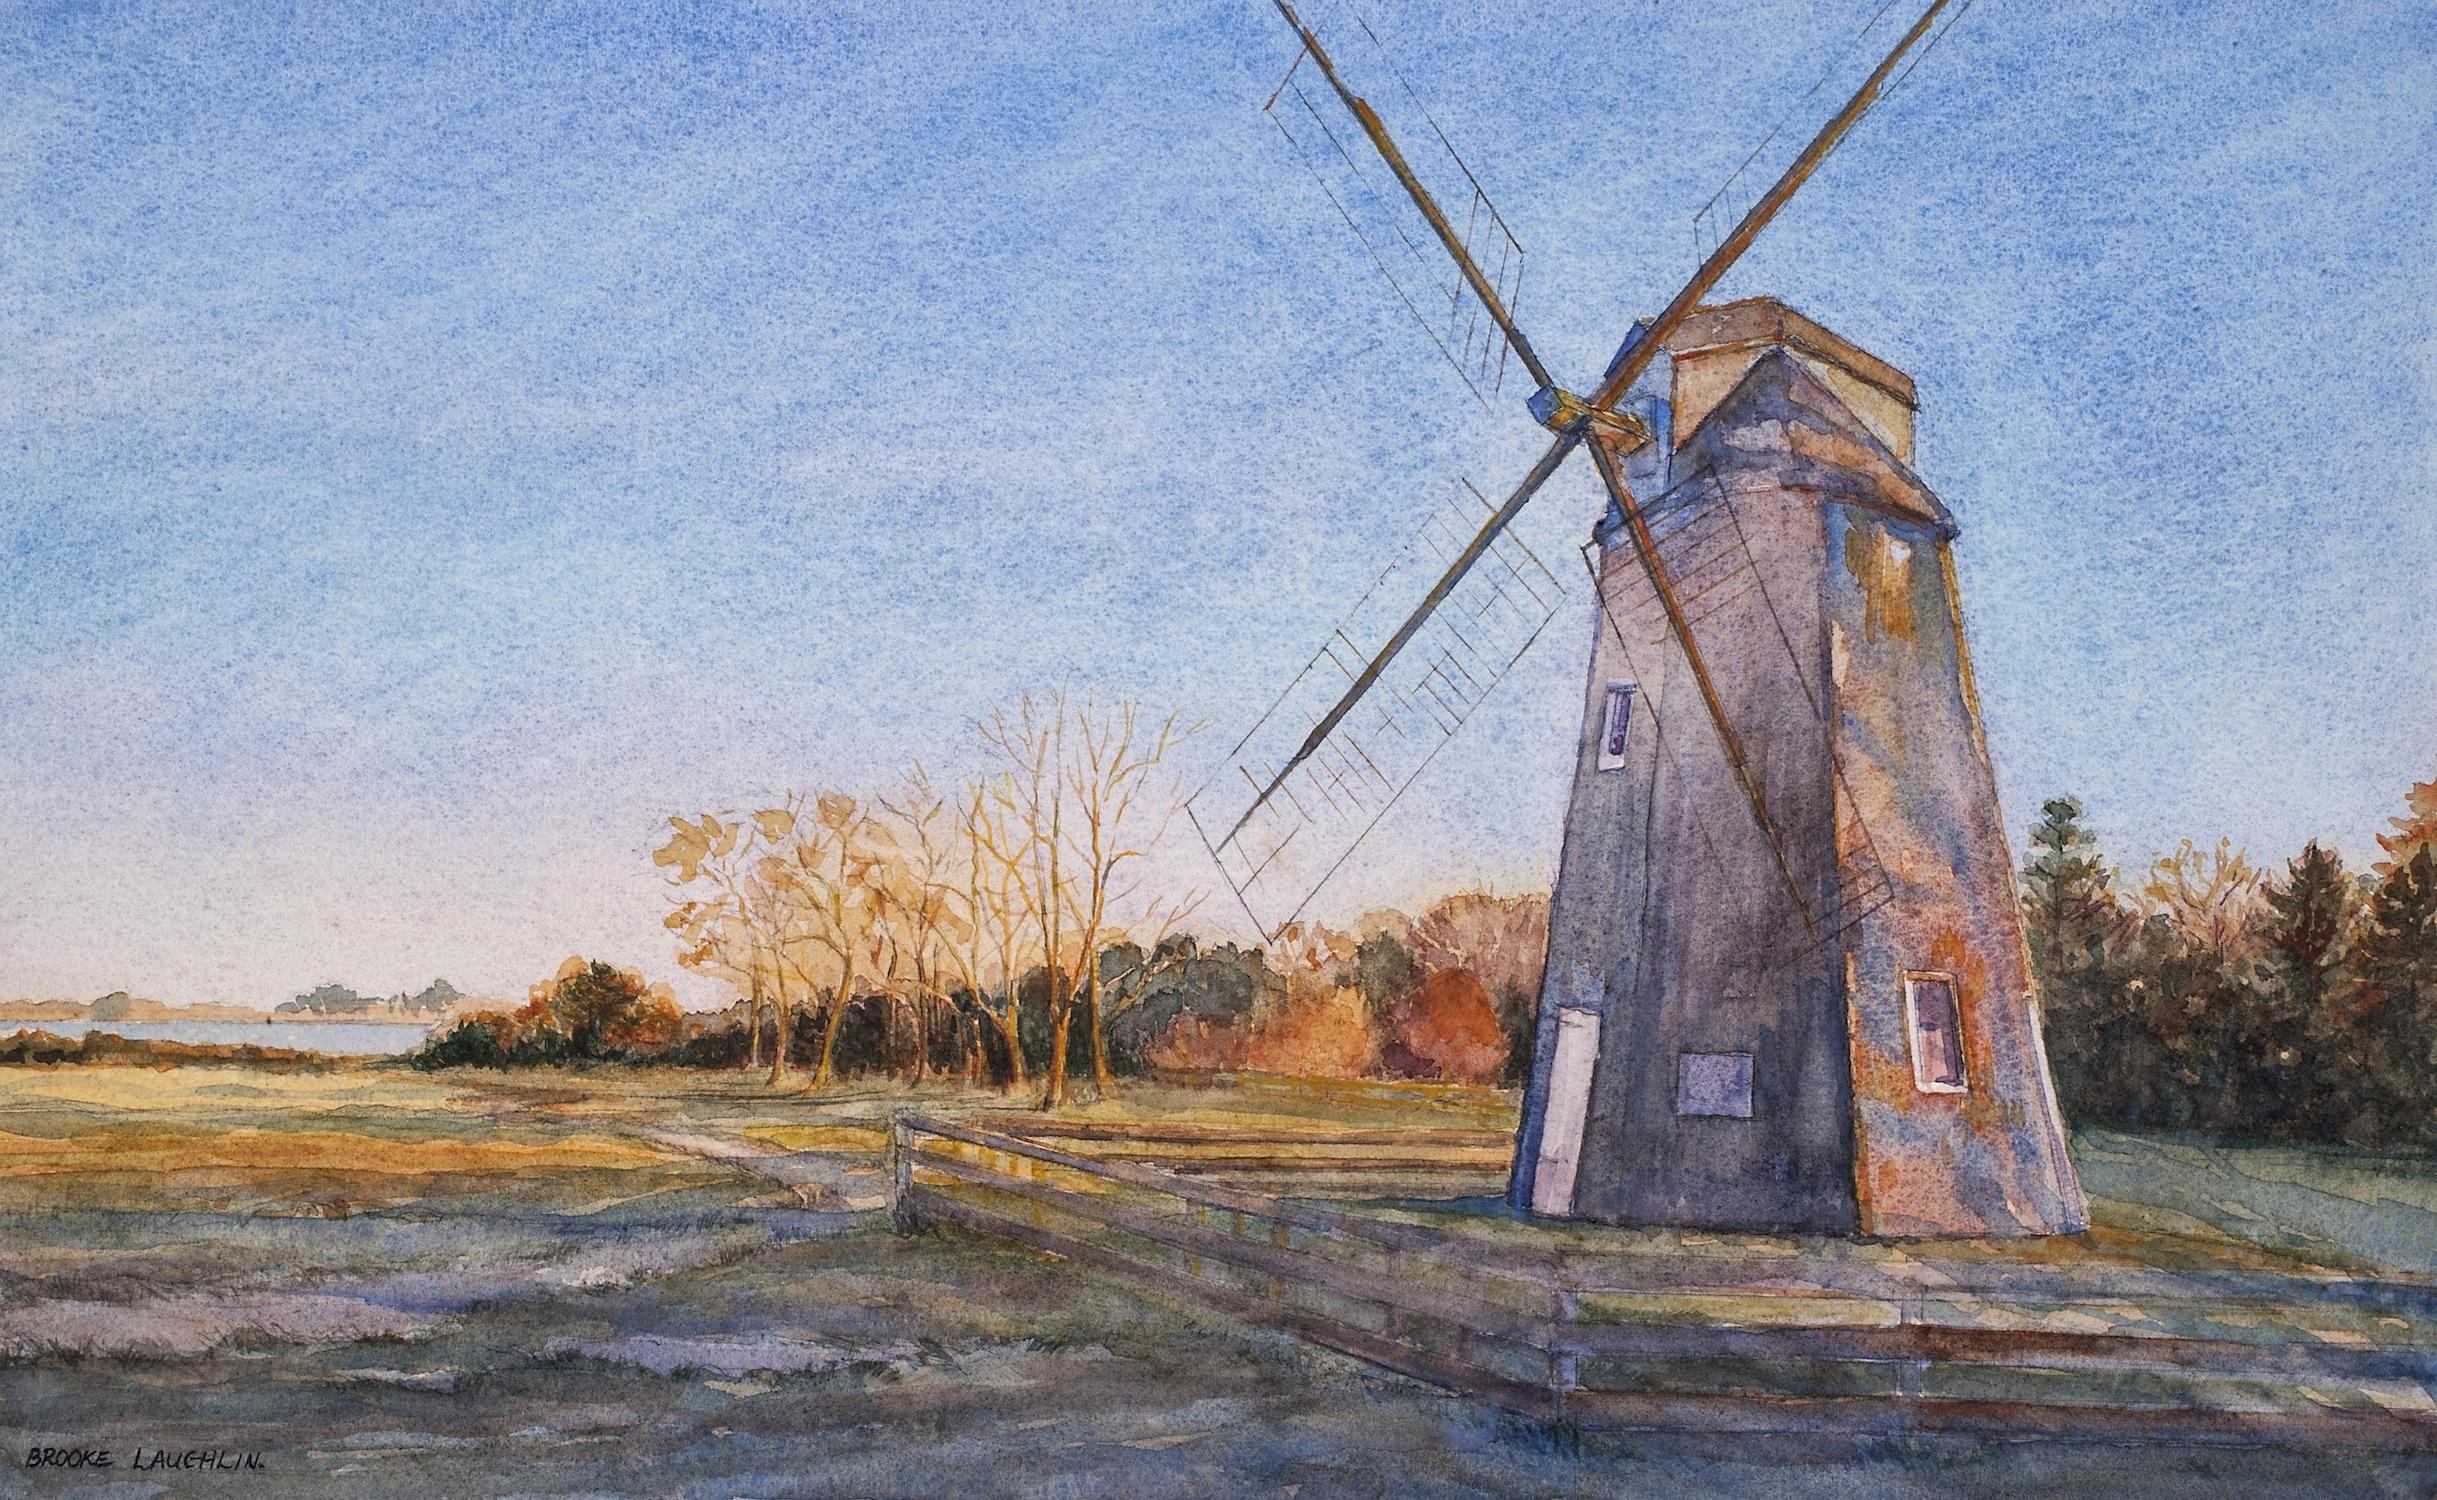 image: Brooke Laughlin Gardiner Windmill, 2015 Watercolor